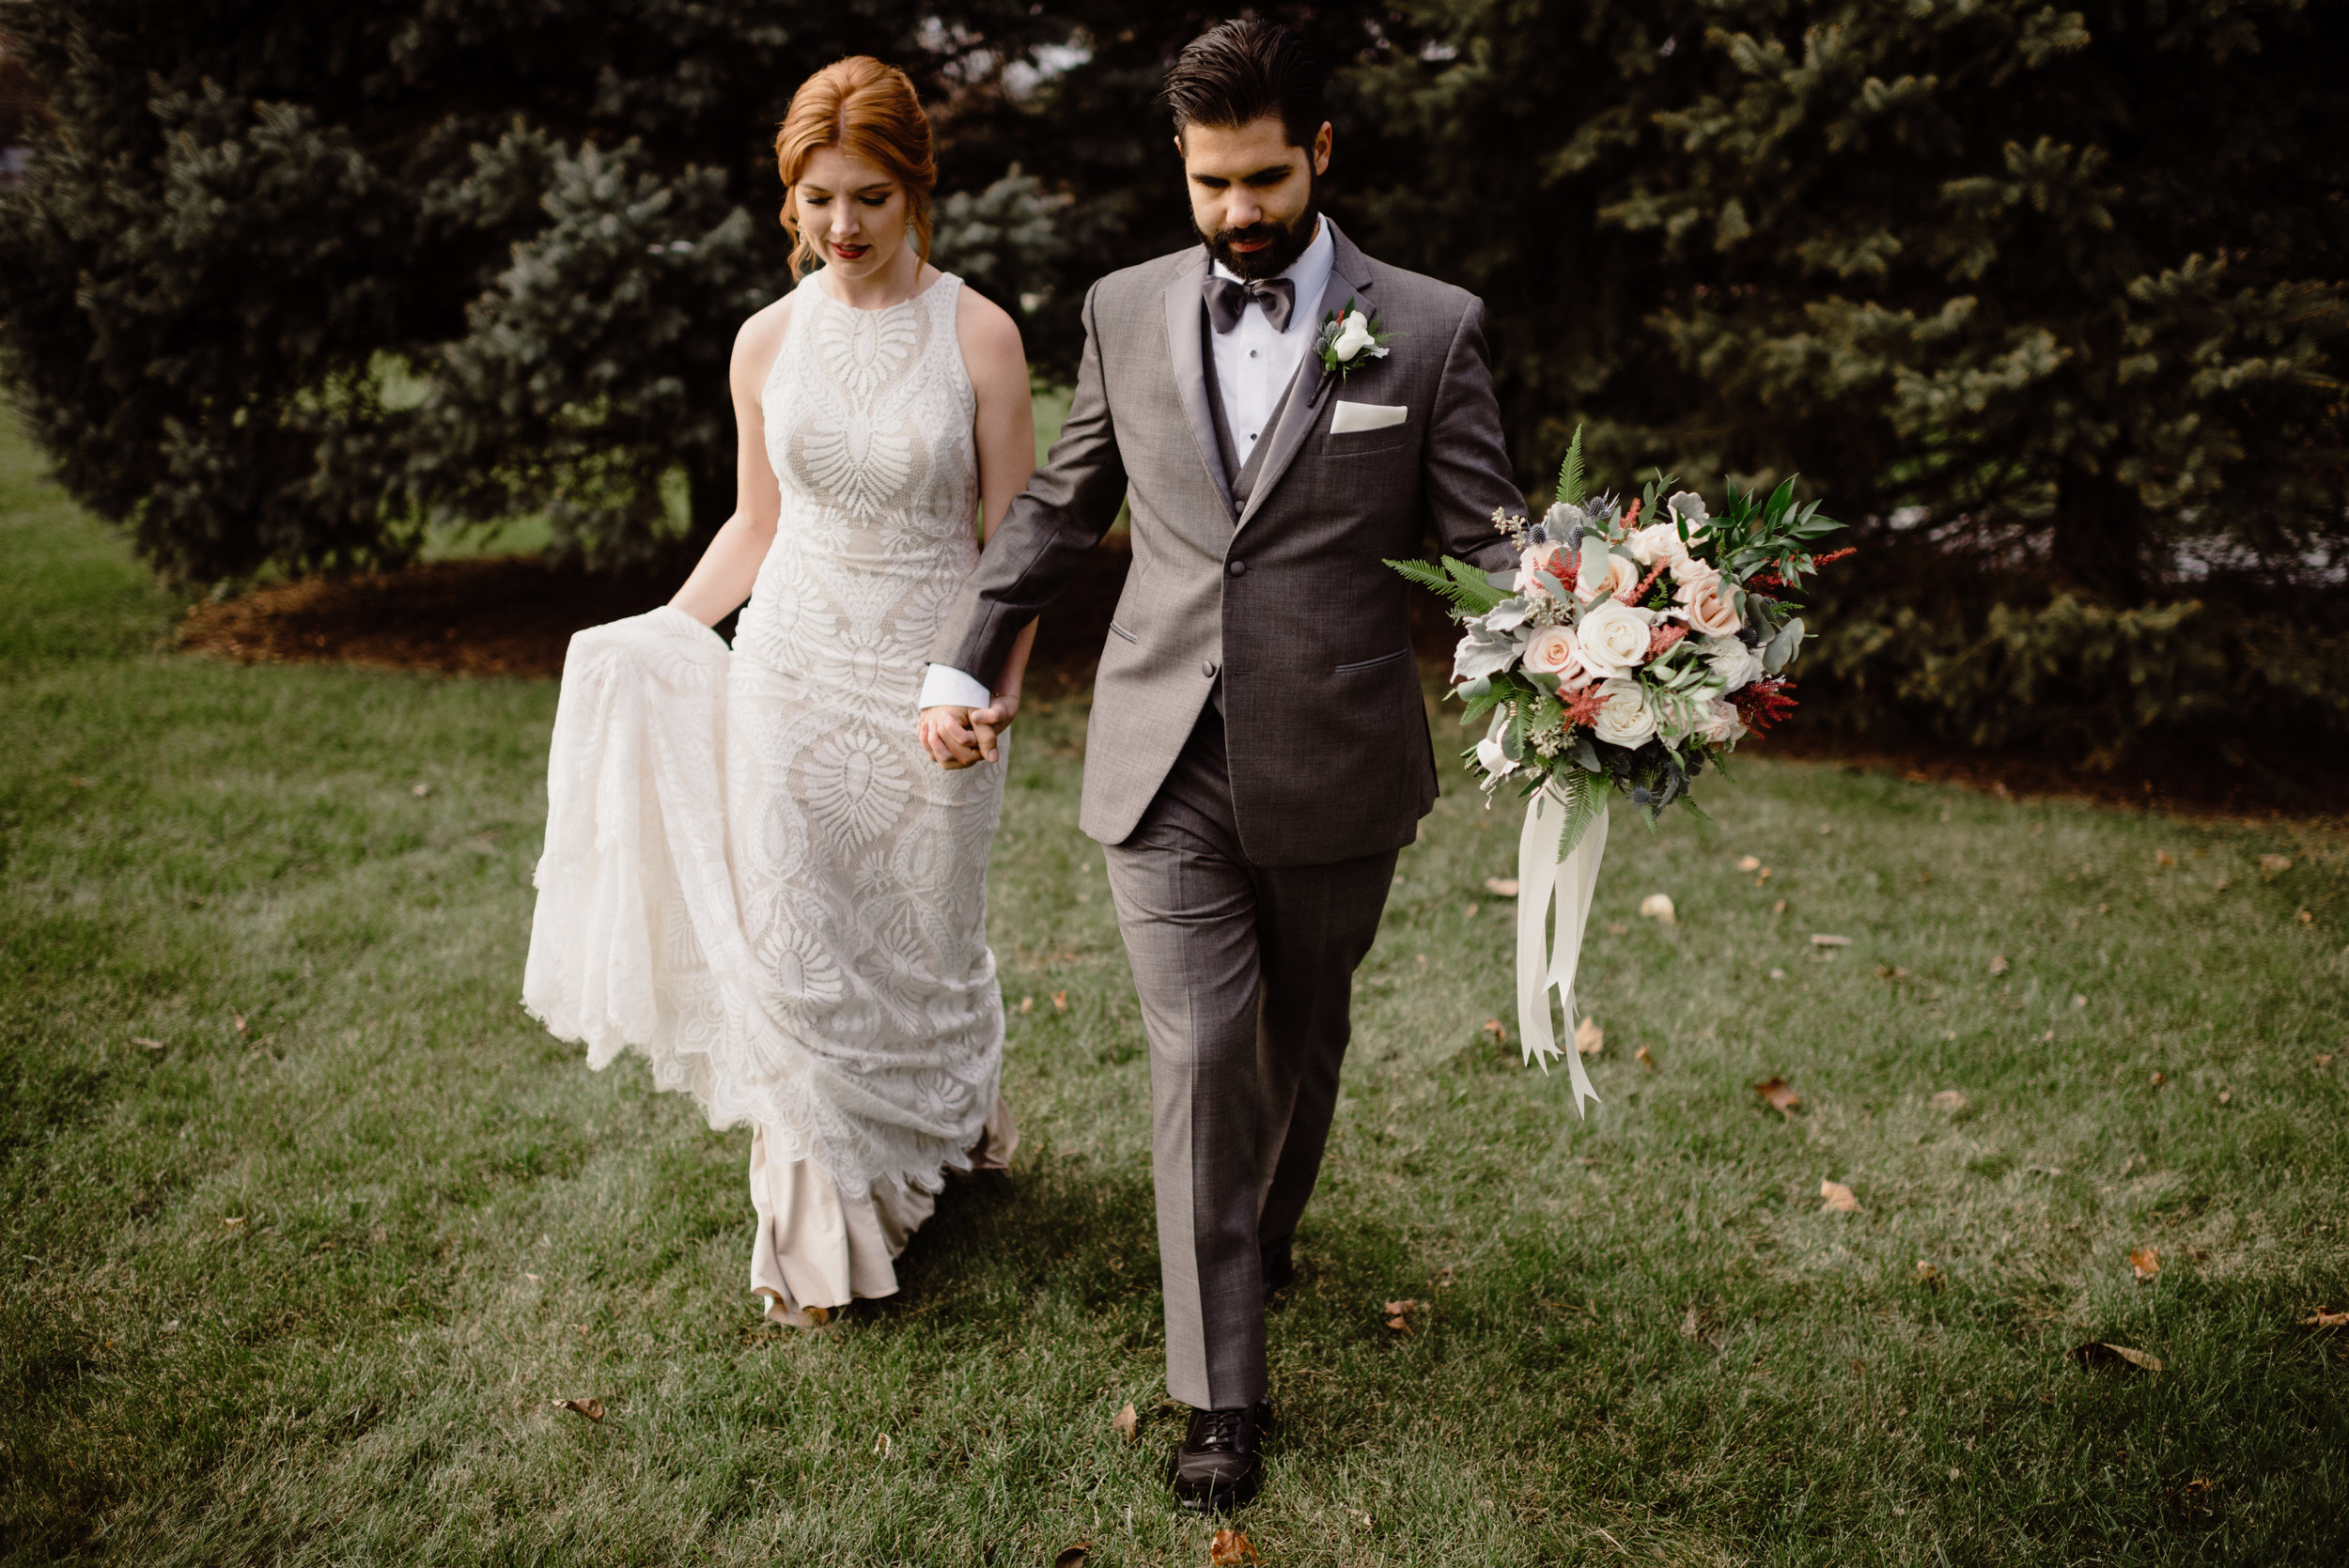 The Brix on Fox, Chicago Wedding Photographer, Zach and Rosalie00083.jpg